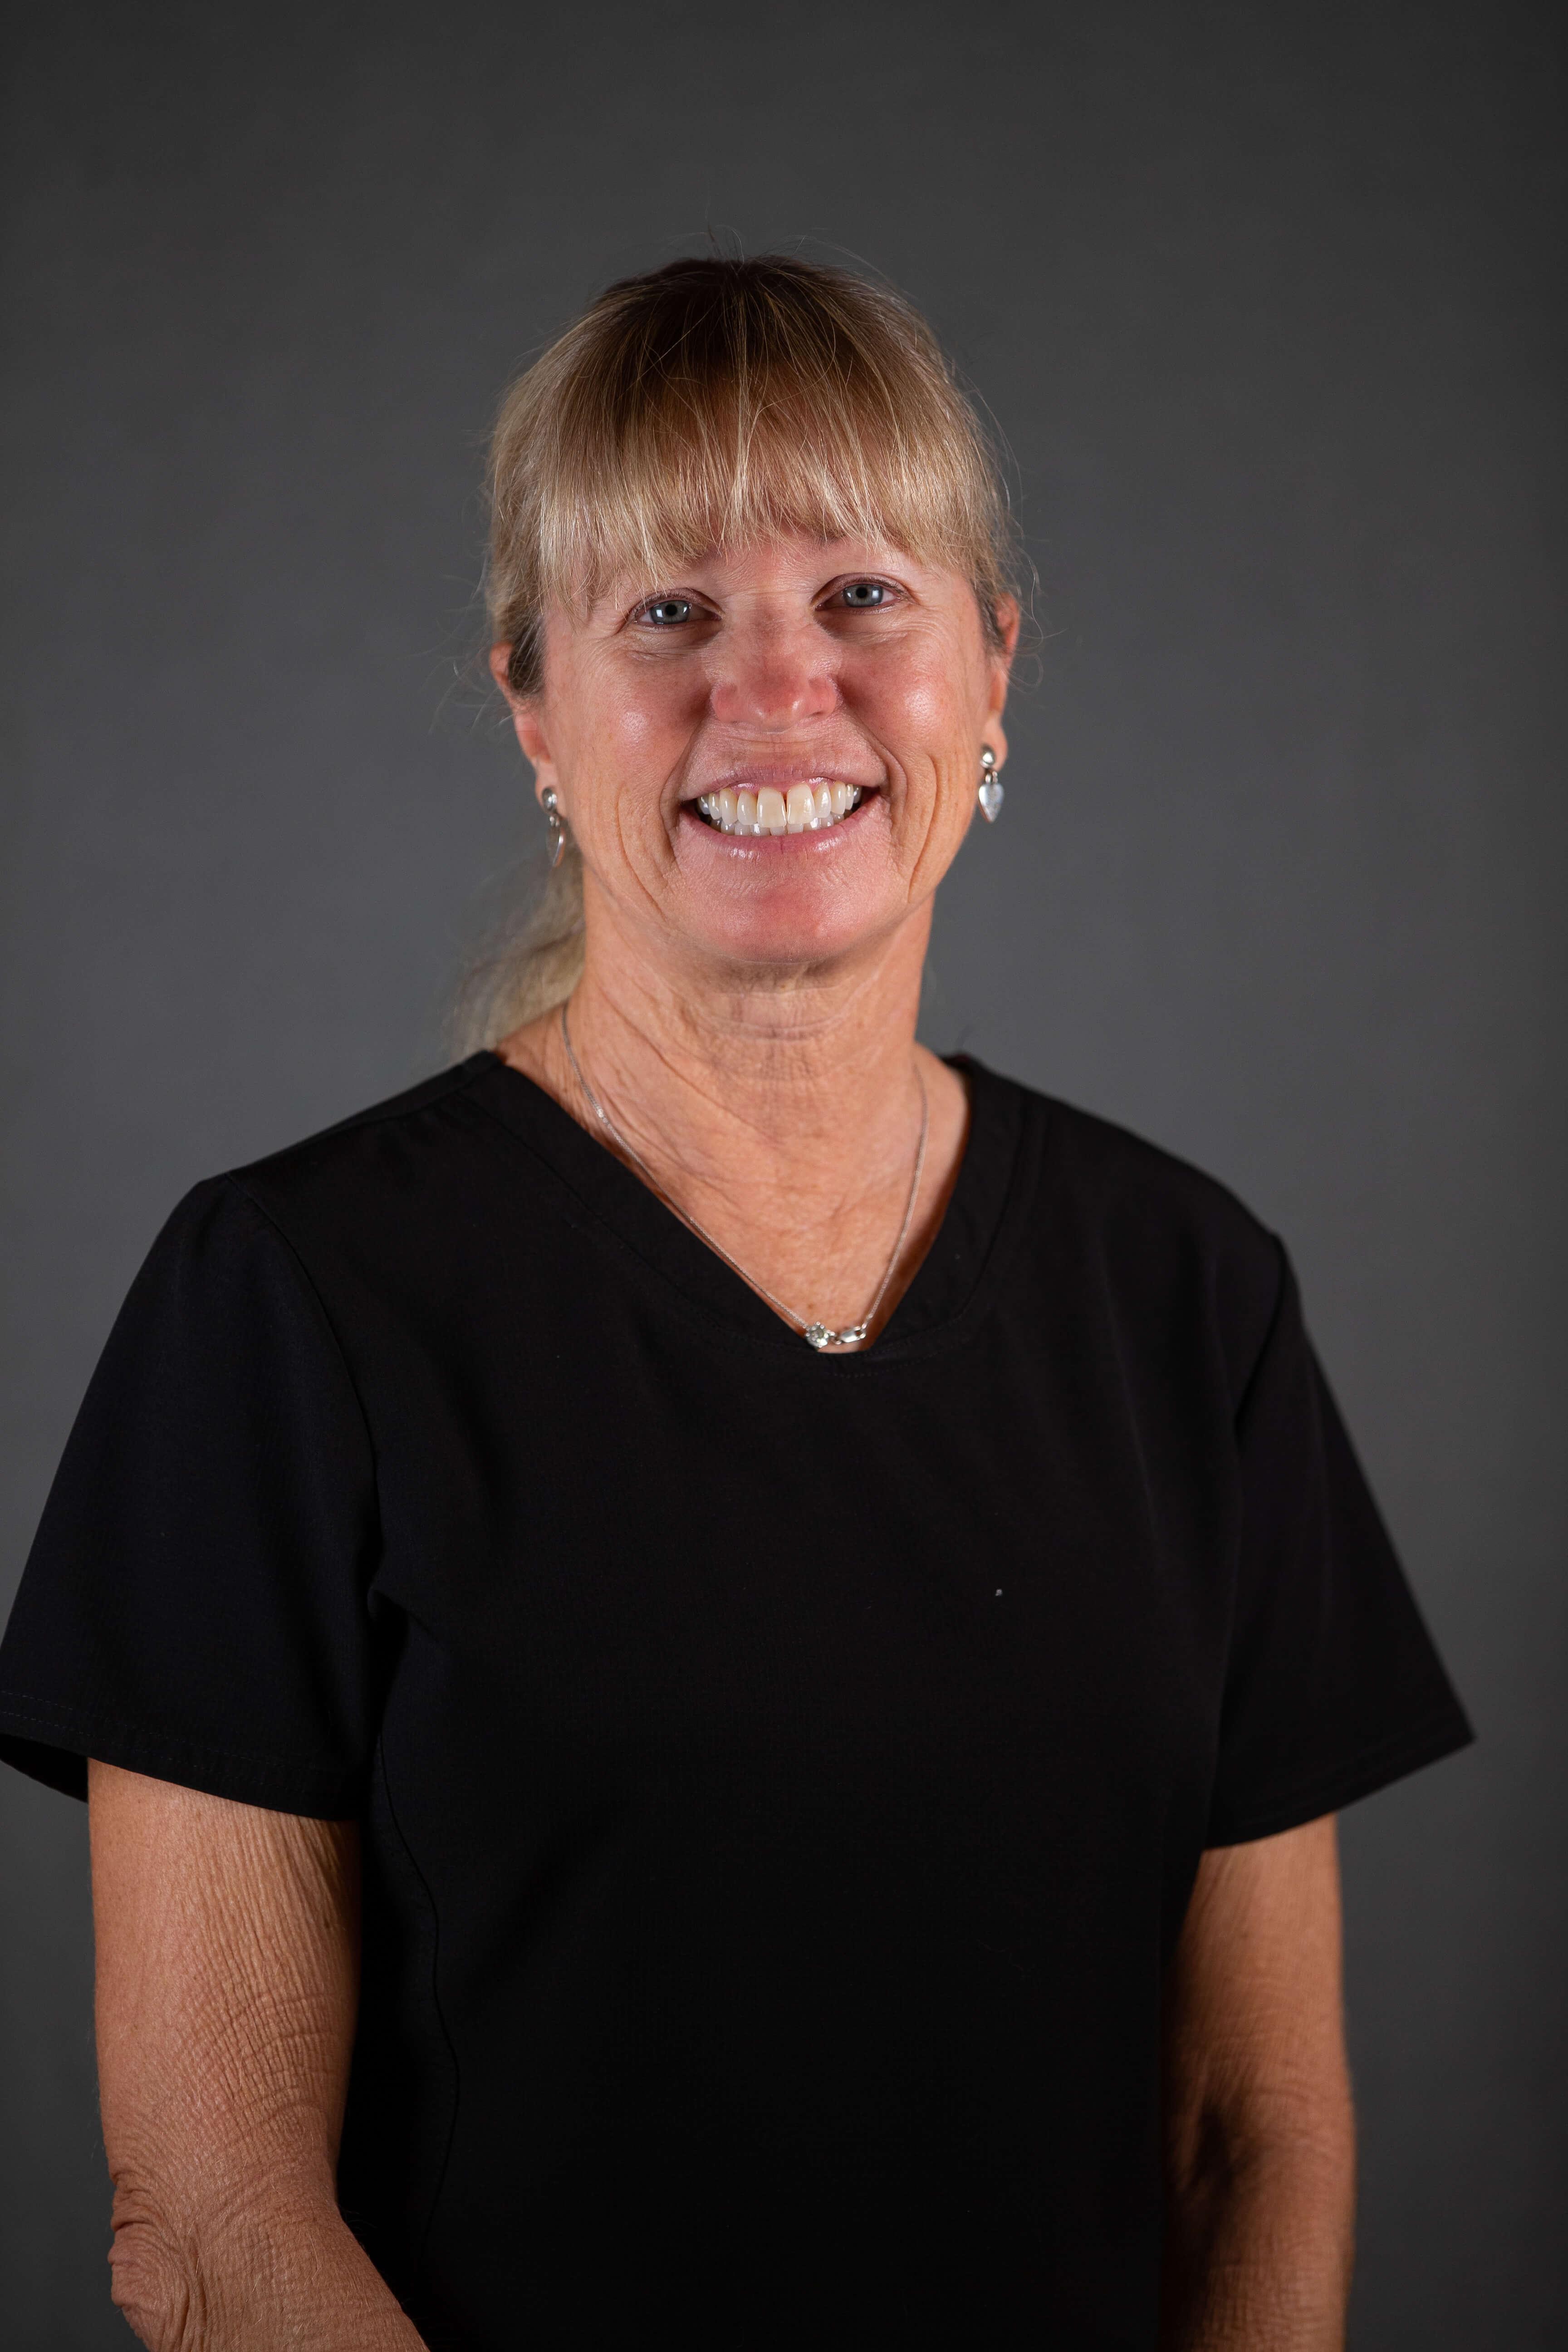 Laura at Solterra Dentistry Headshot